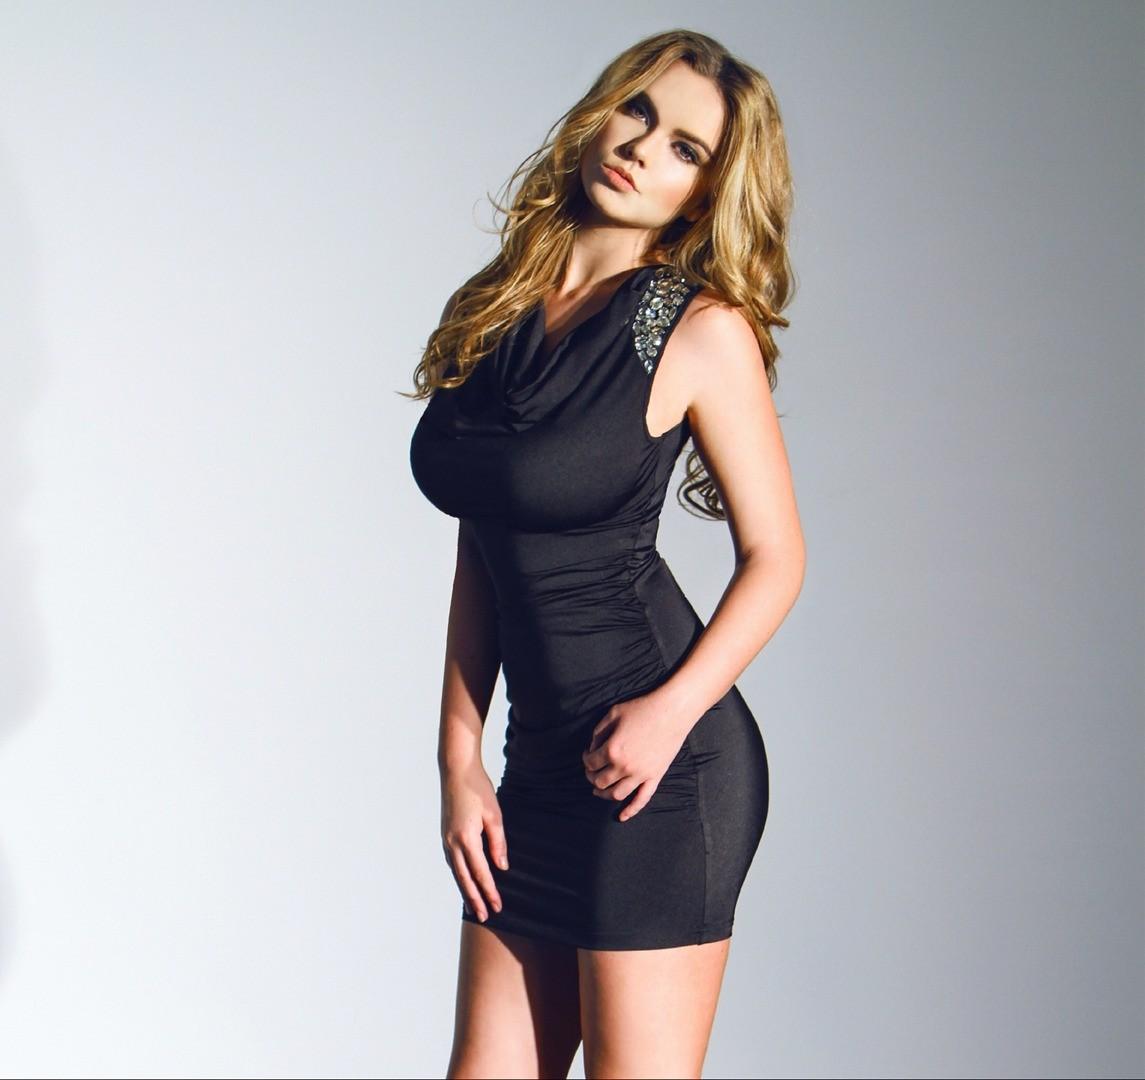 Hintergrundbilder Modell Blond Fotografie Grosse Bruste Mode